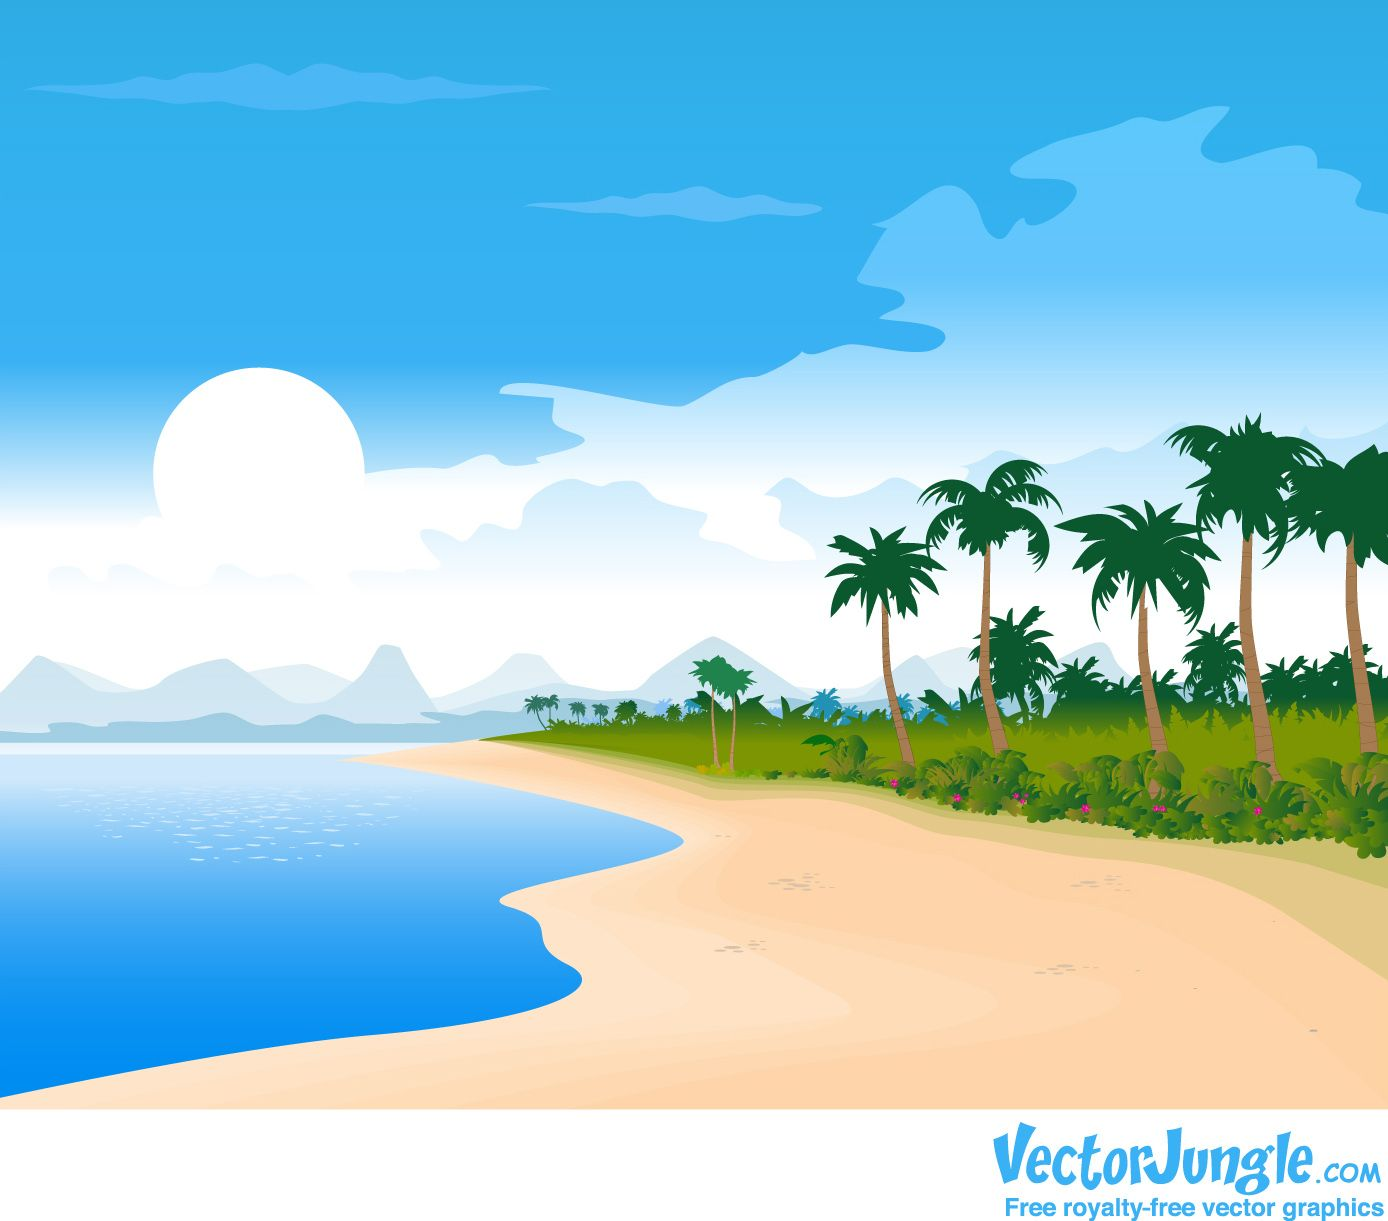 free beach images - Google Search | Beach wallpaper ...